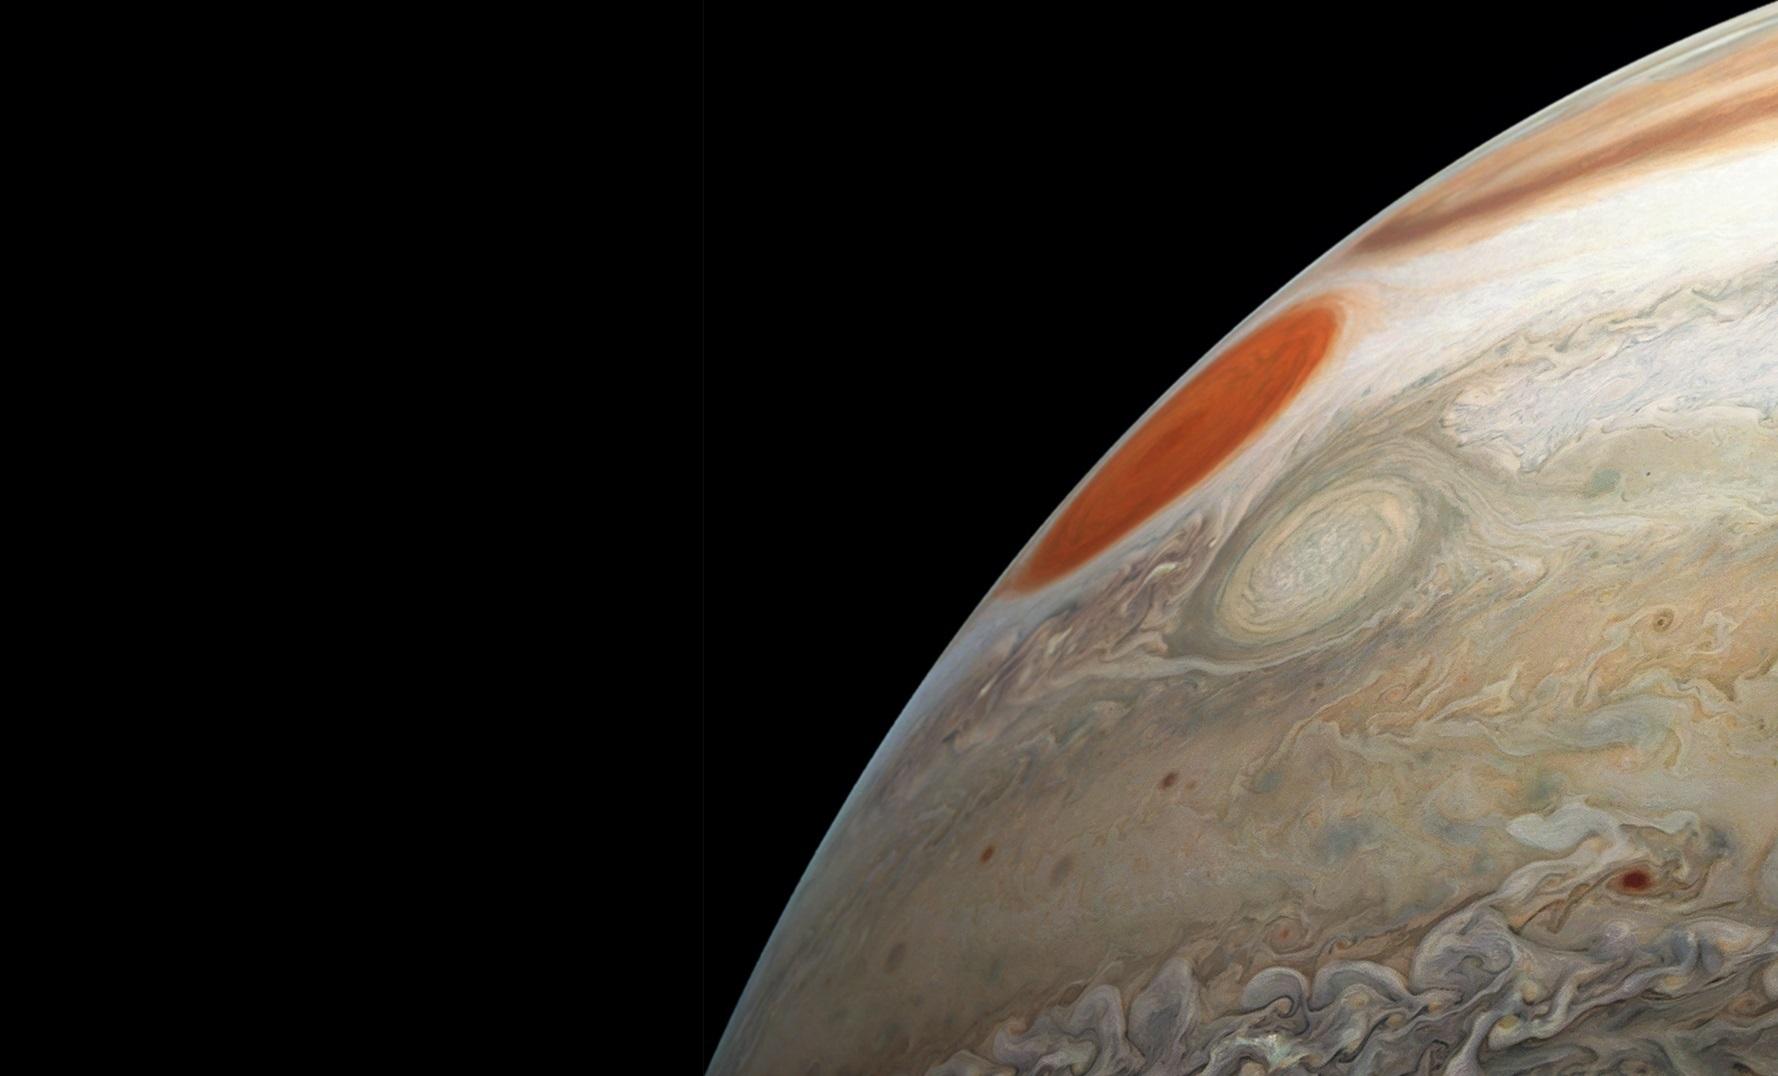 Зонд «Juno» показал сразу два шторма на Юпитере